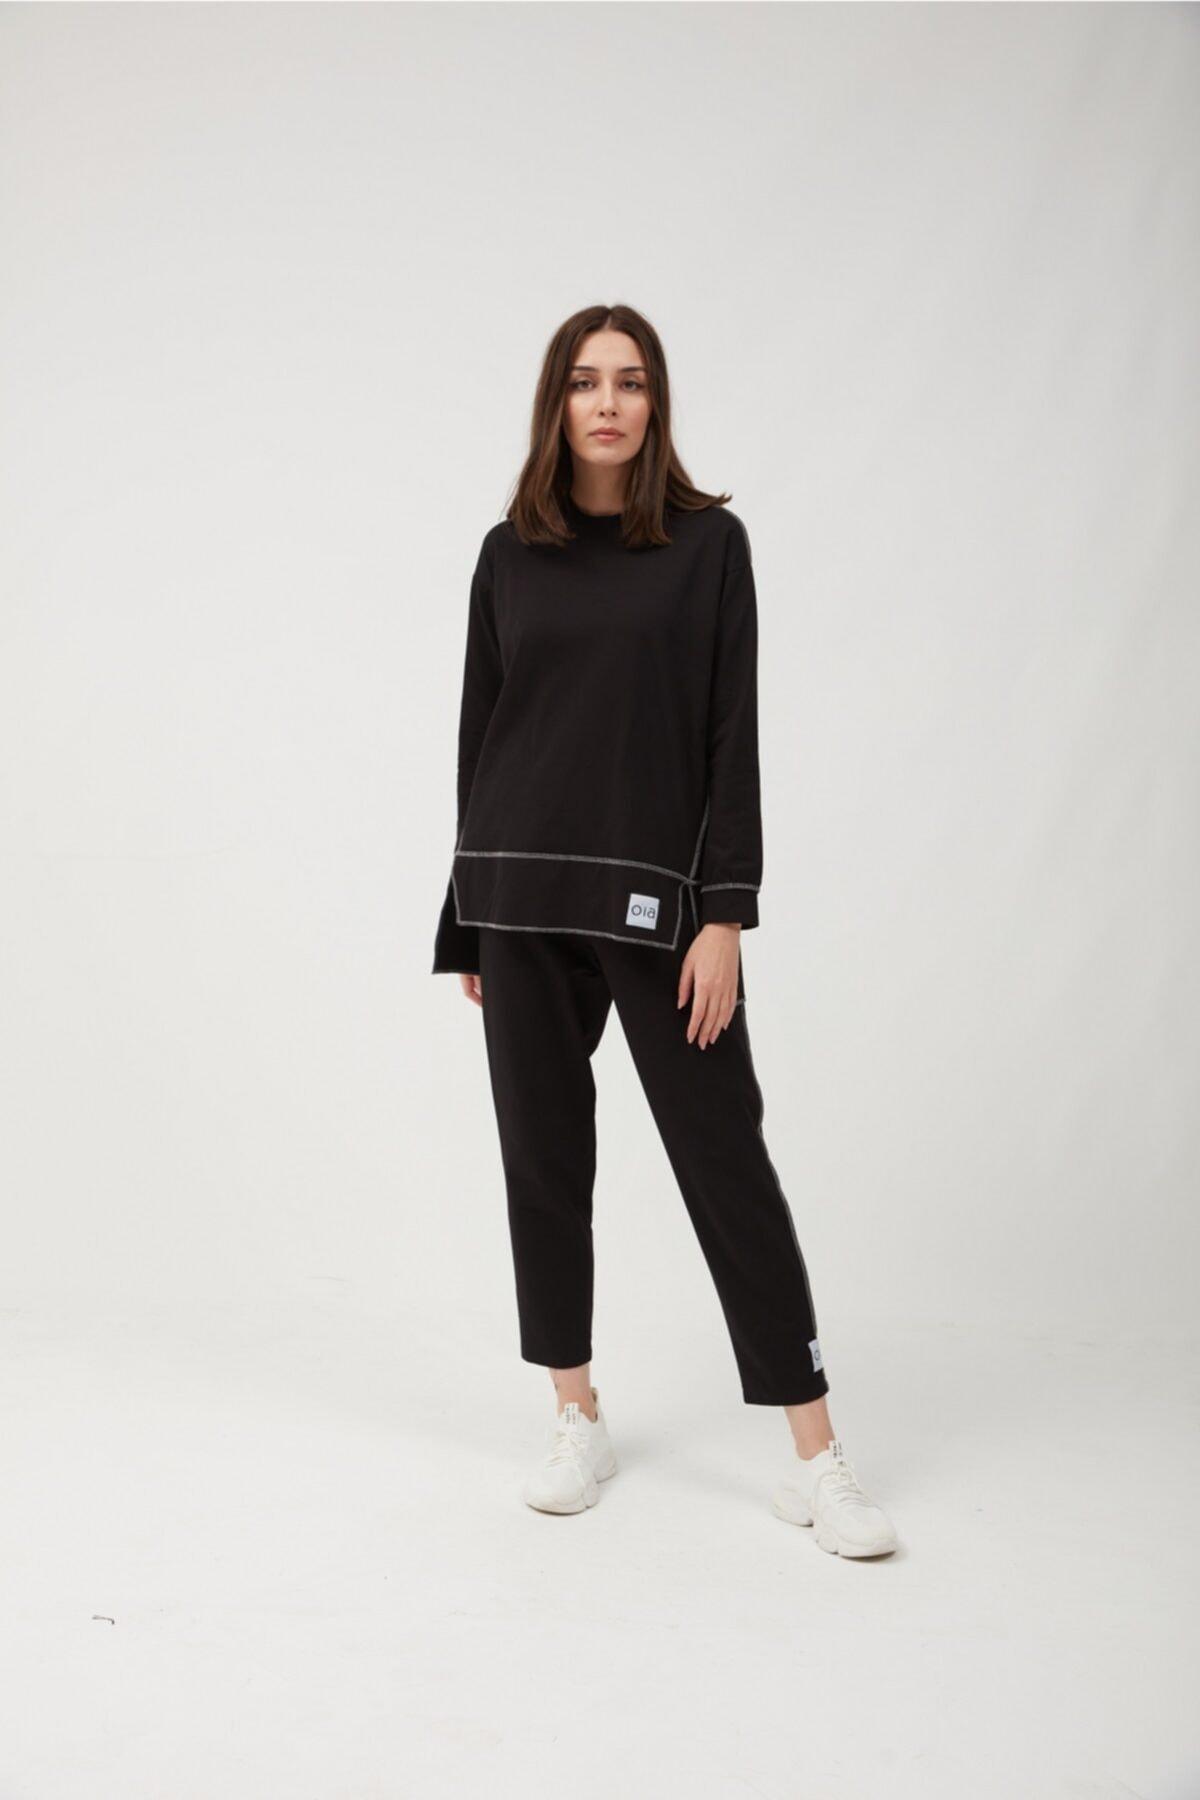 Kadın  Siyah Pamuklu Tunik Pantolon Takım